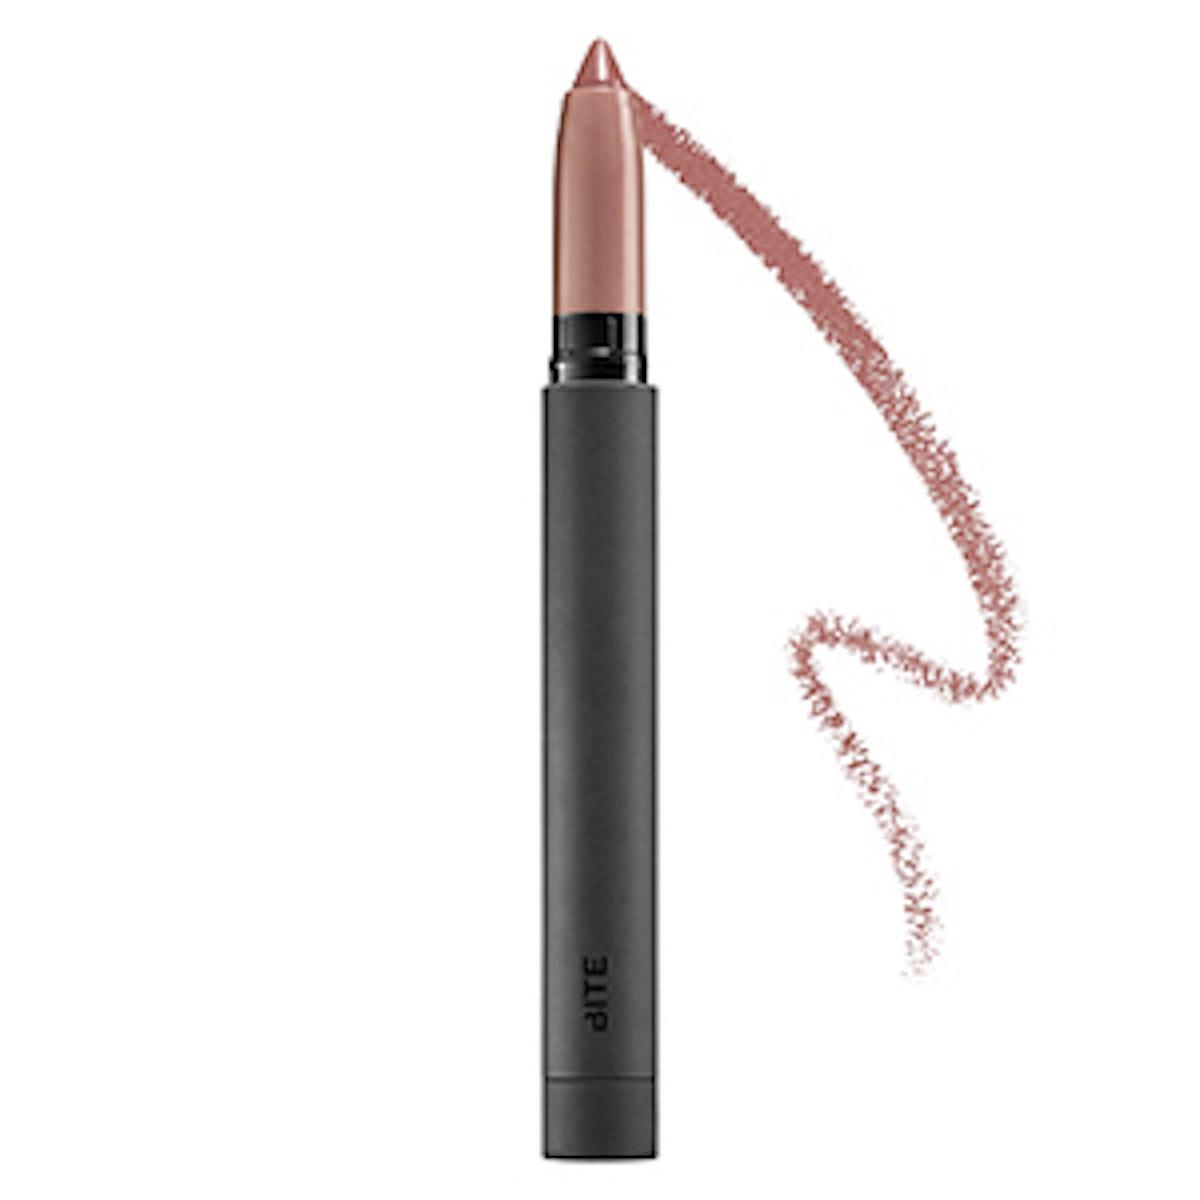 Matte Creme Lip Crayon in Dusty Pale Pink